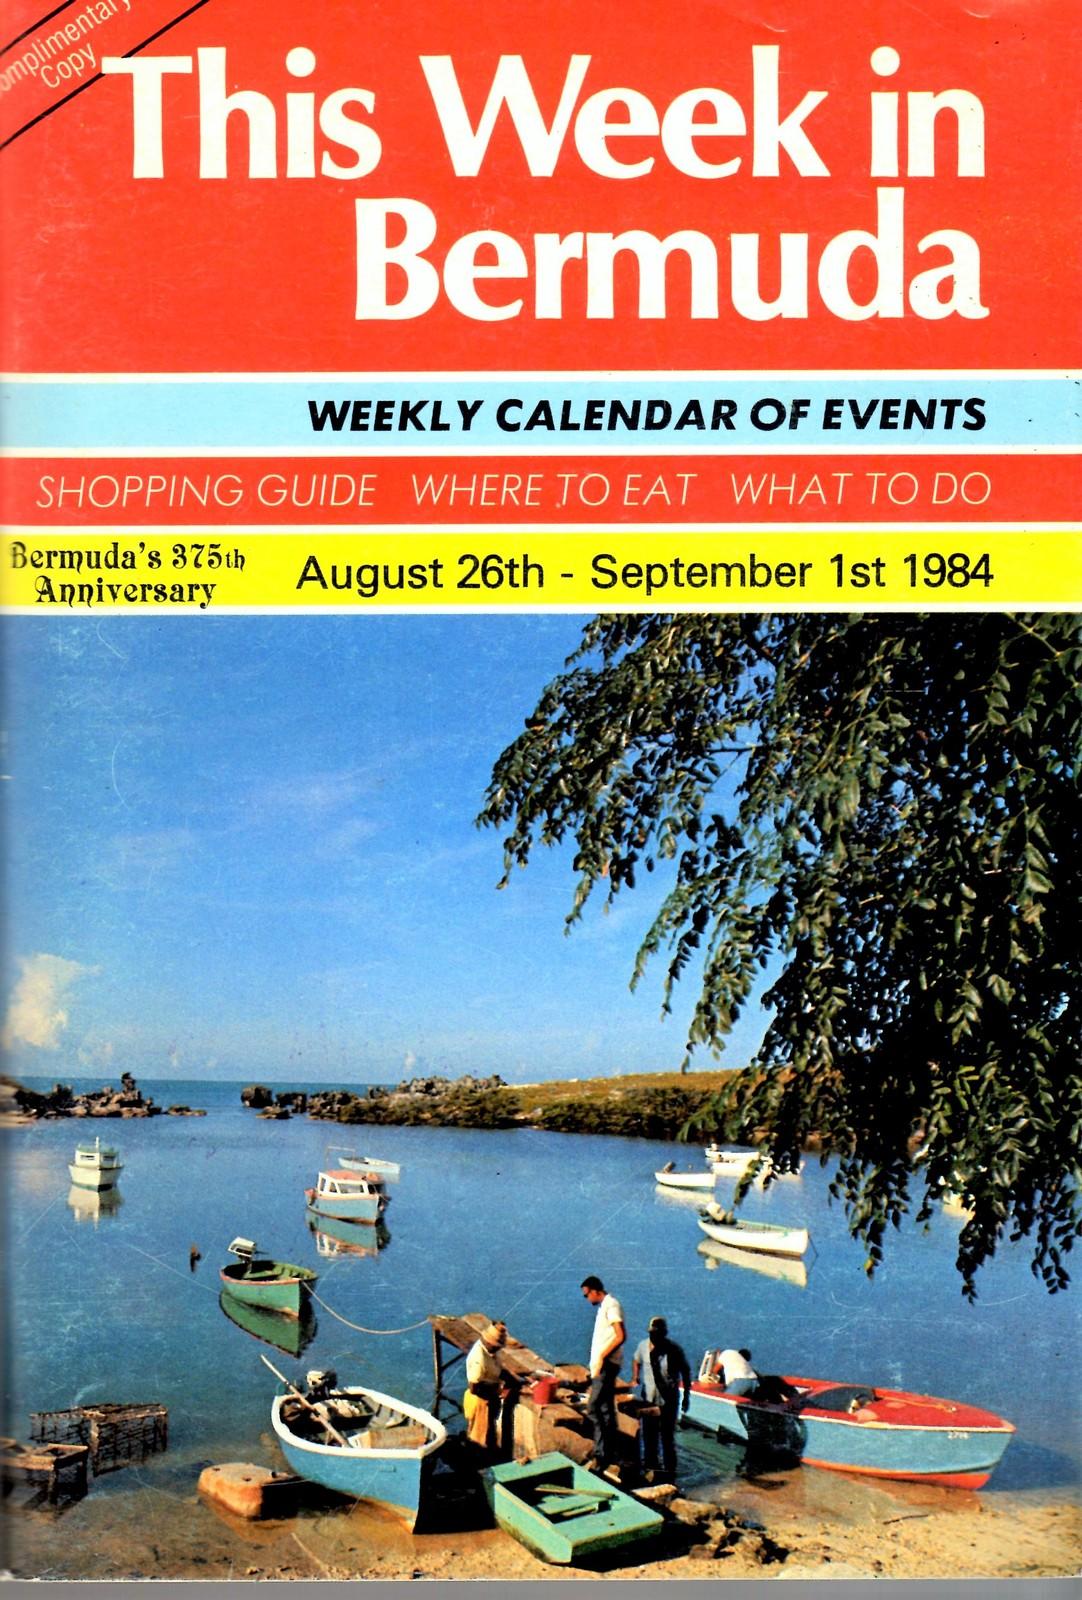 Bermuda (4 Books) image 7